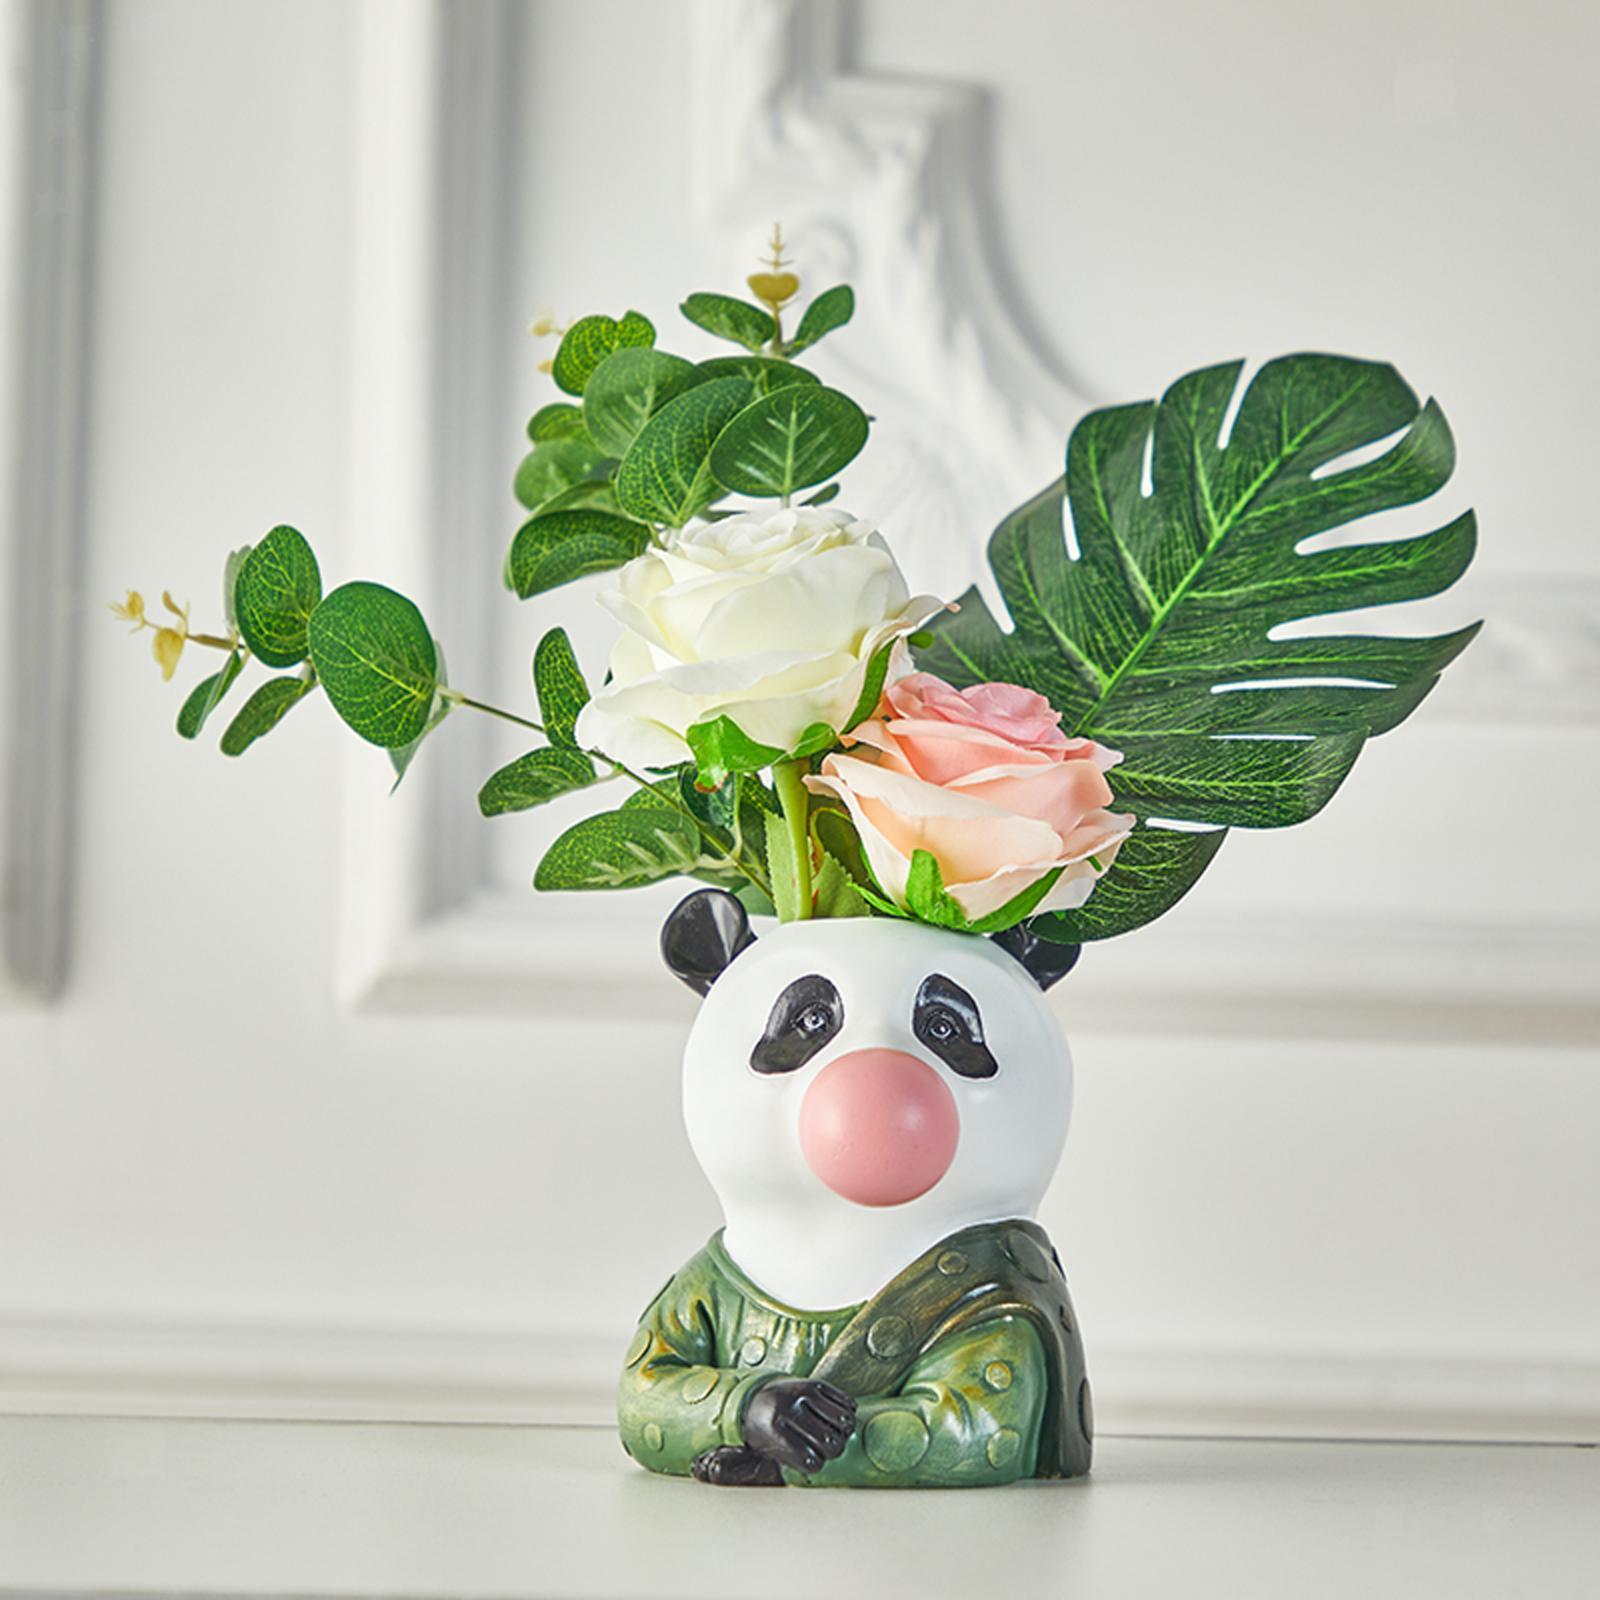 Indexbild 18 - Harz Tierkopf Trockenblume Vase Pflanzer Topf Home Office Bar Desktop Ornament